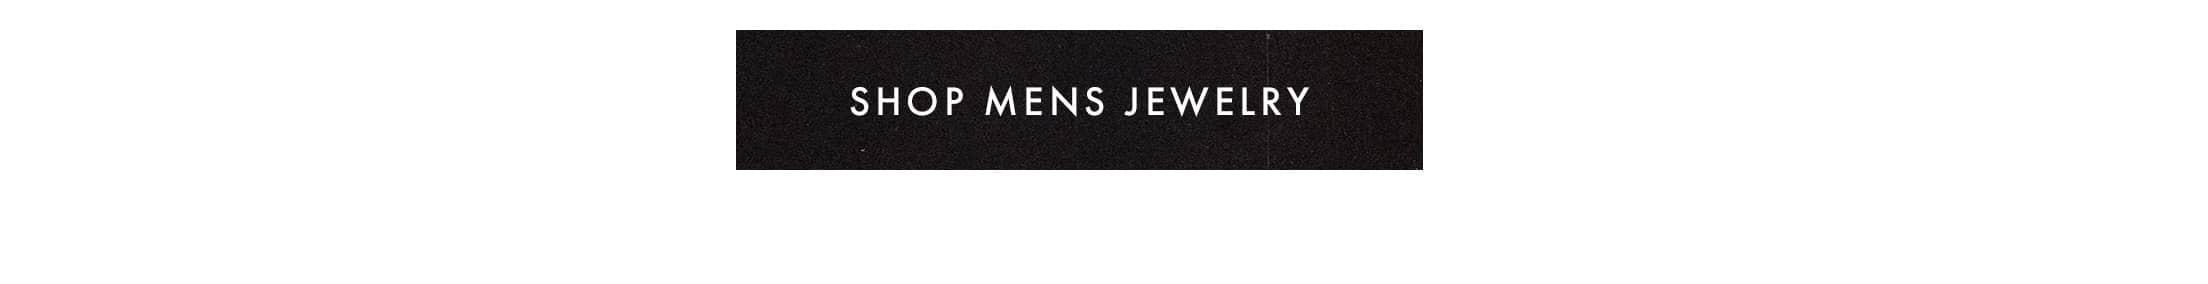 Shop Mens Jewelry